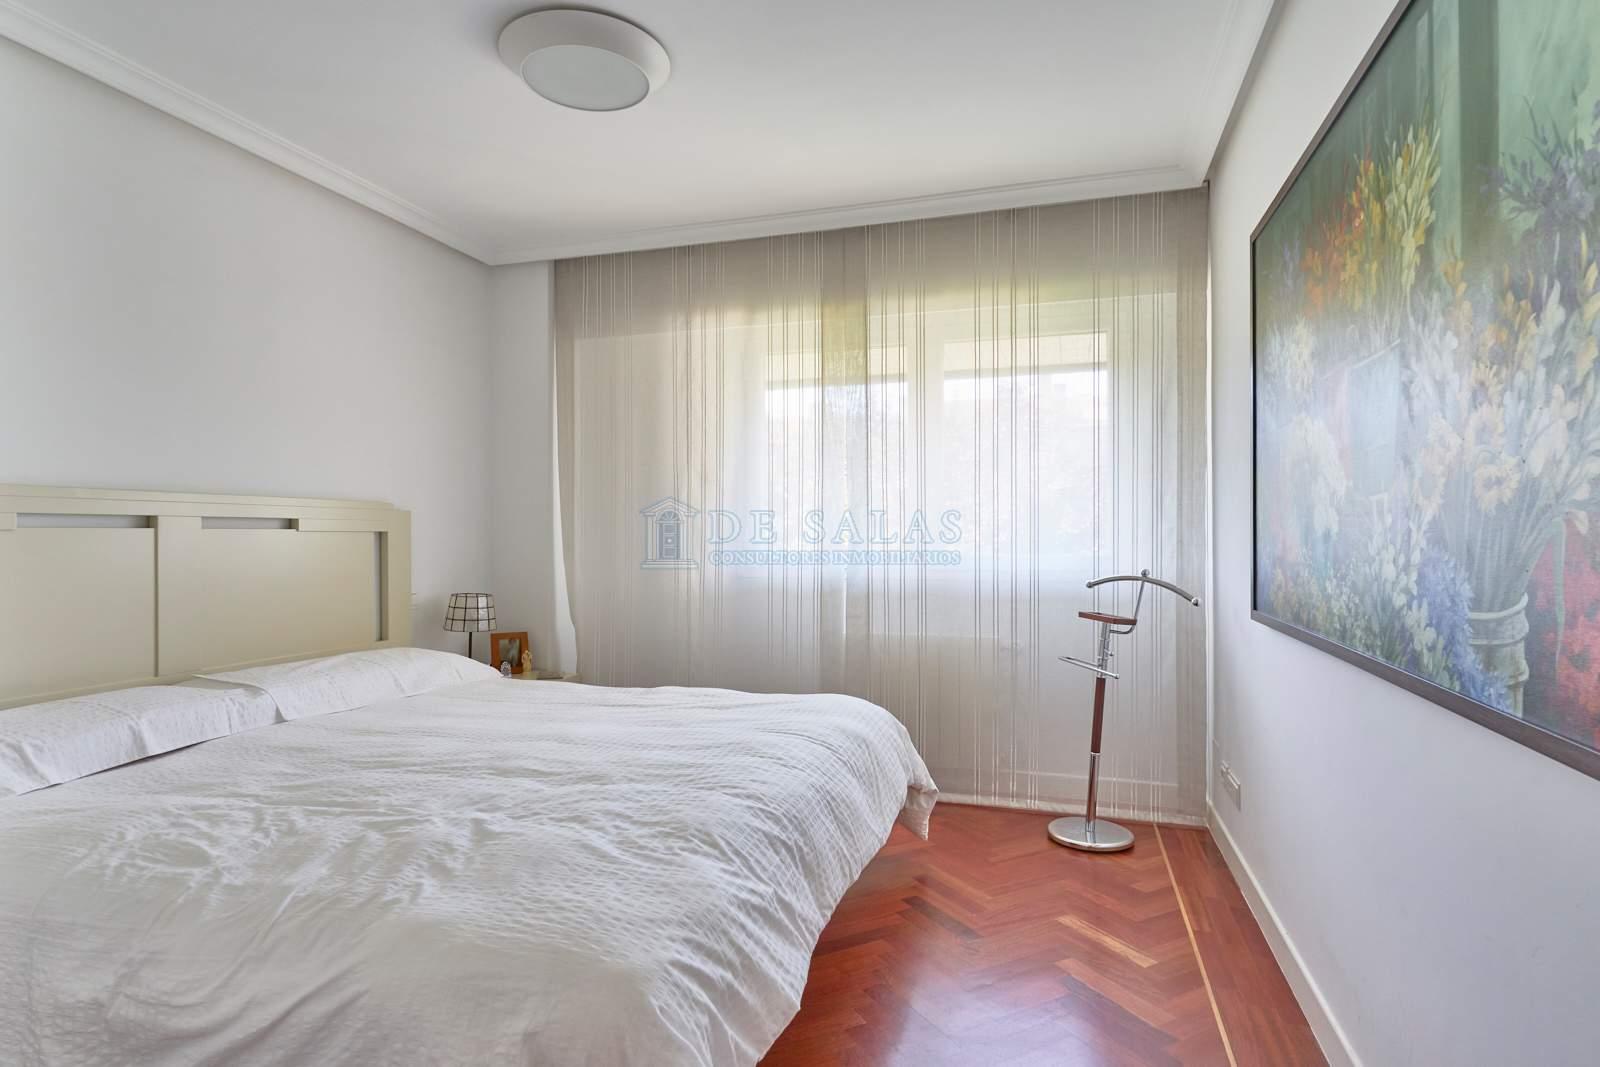 Dormitorio-0022